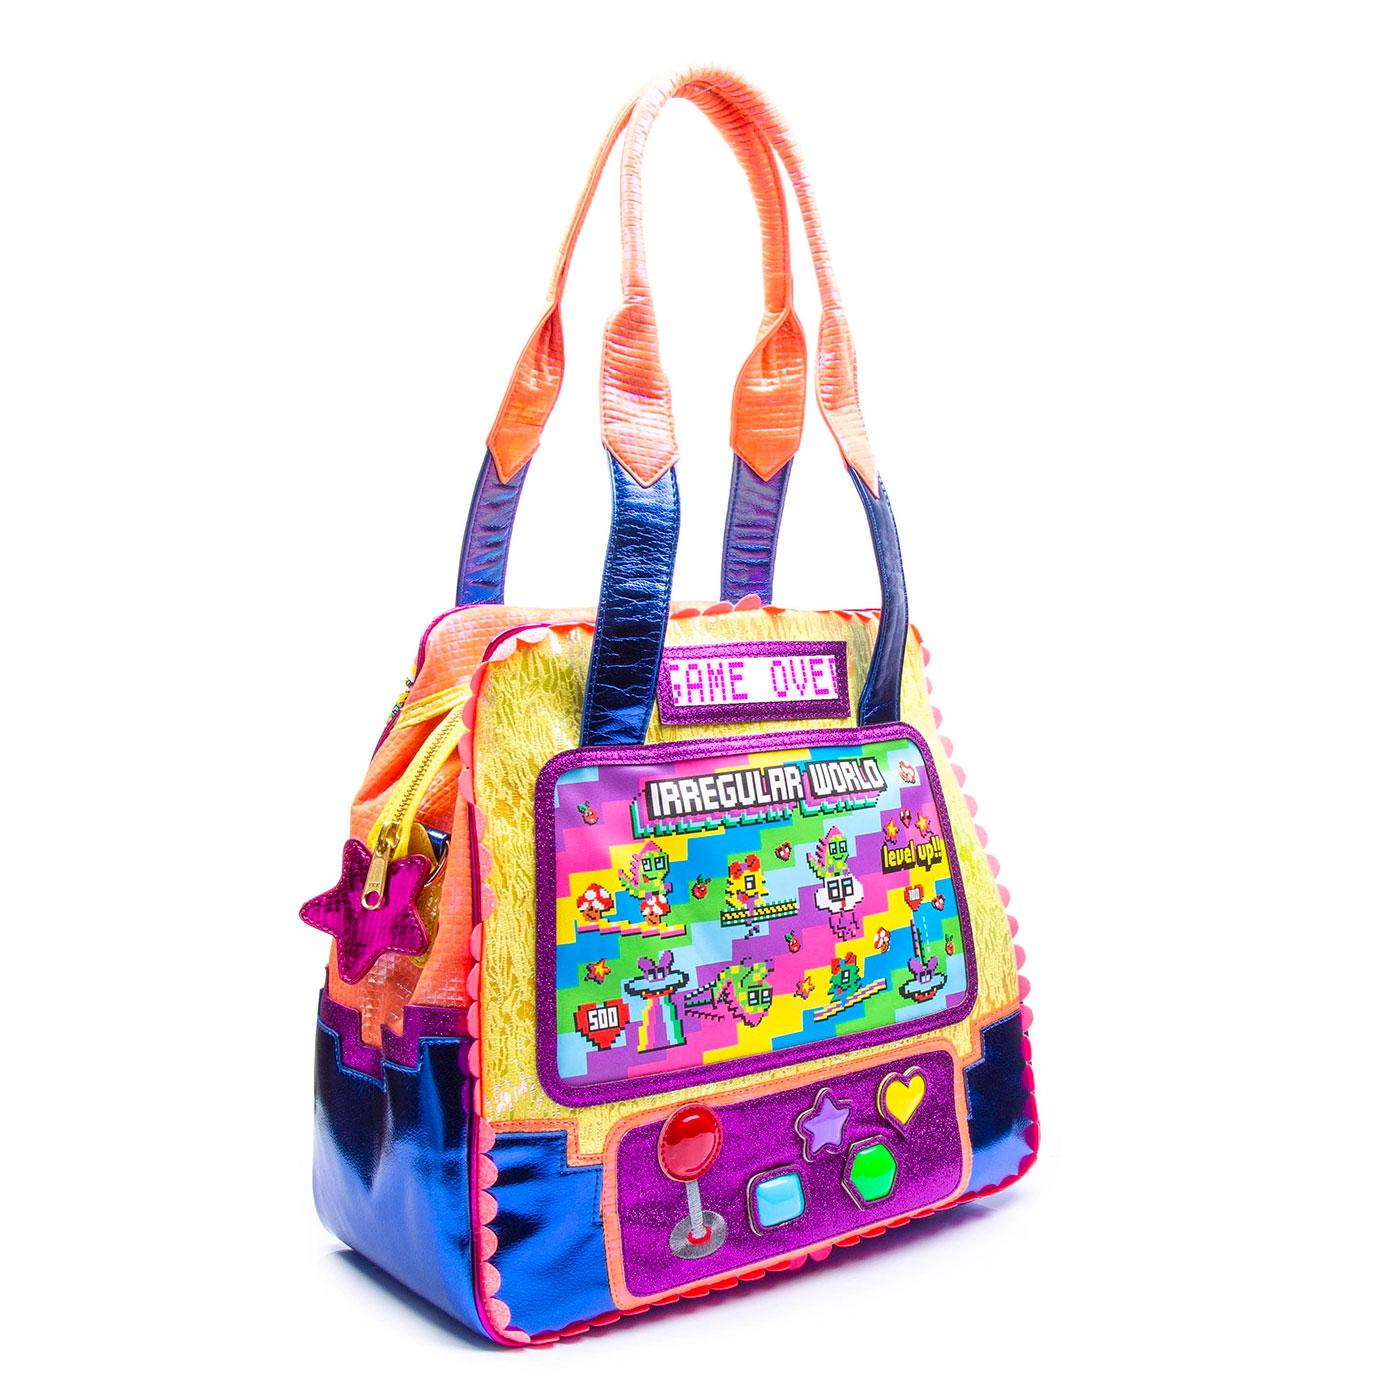 Wowcade IRREGULAR CHOICE Retro Gaming Handbag Y/B